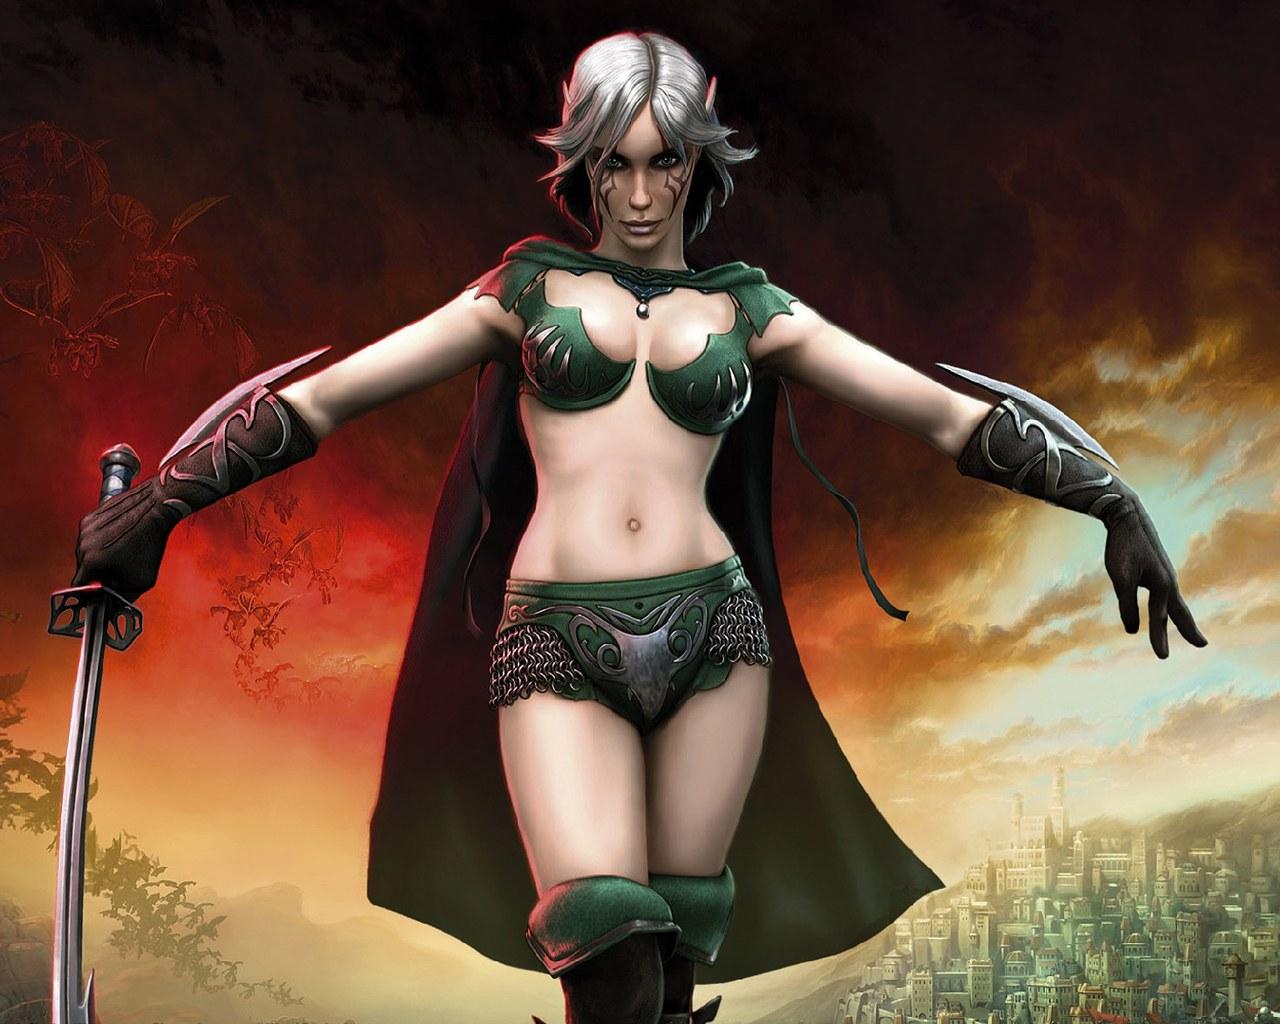 Обои SpellForce 2 Shadow Wars: SpellForce, Девушки из игр.